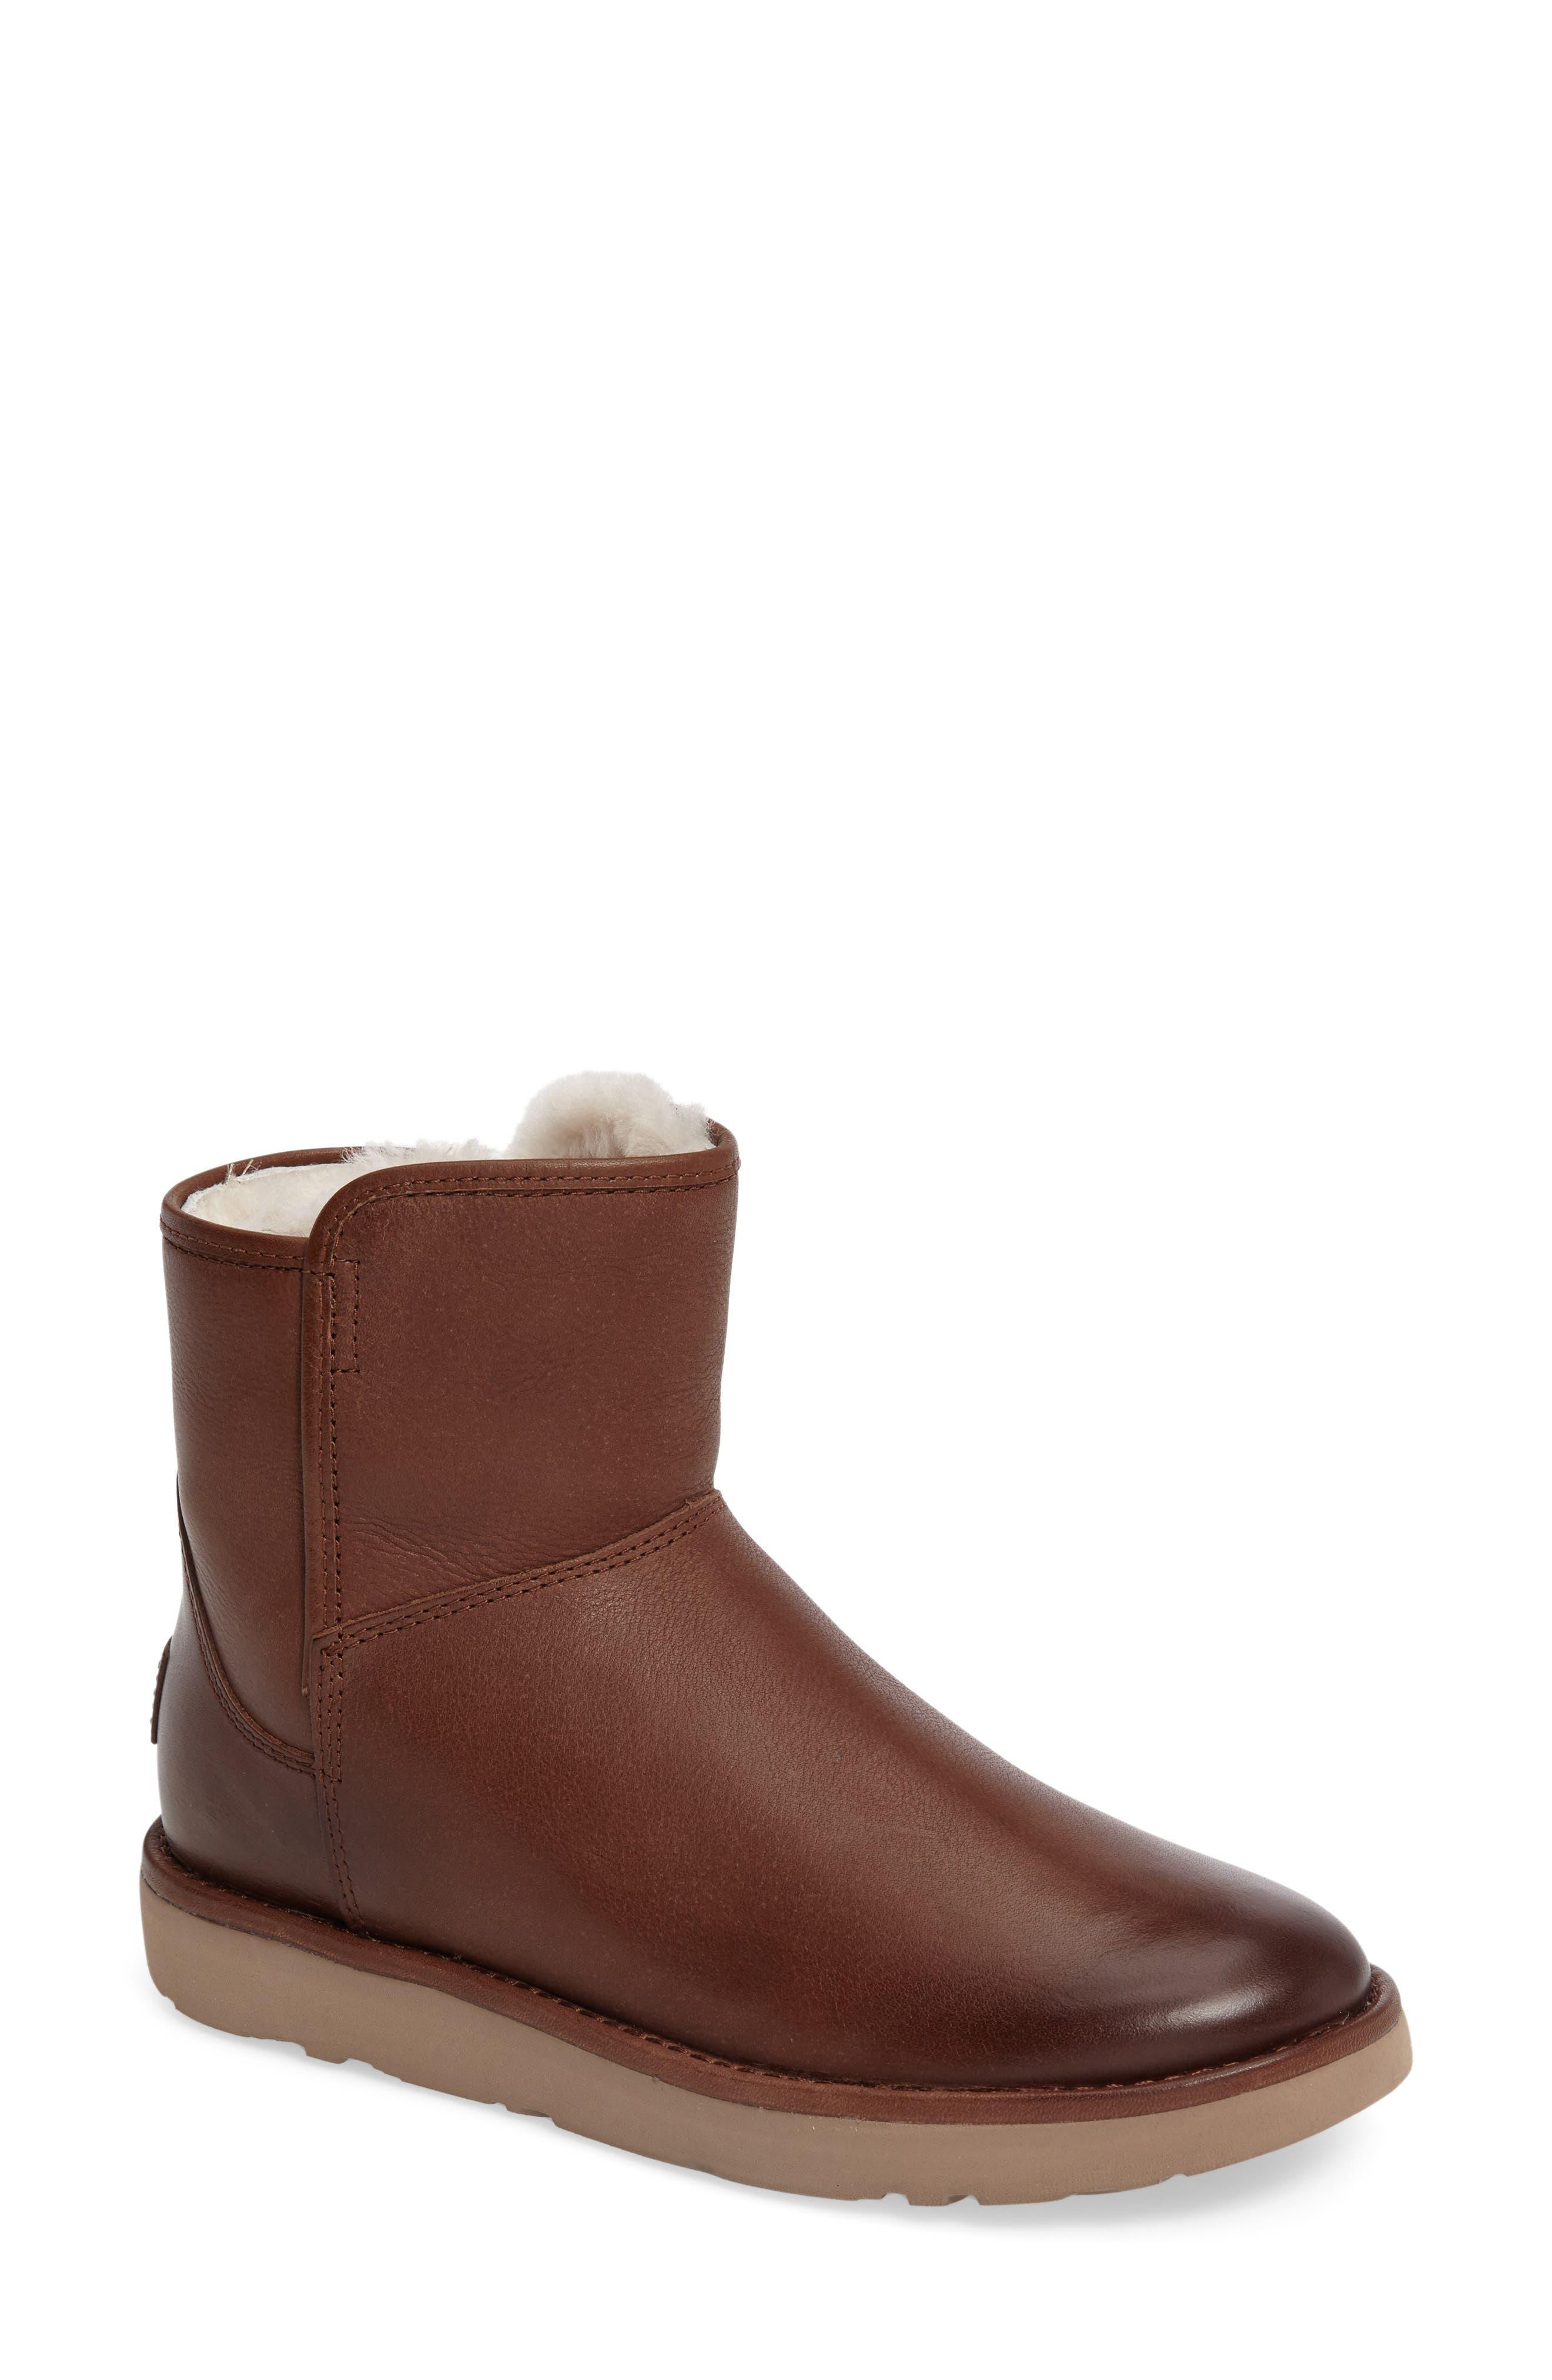 Alternate Image 1 Selected - UGG® Abree Mini Boot (Women)